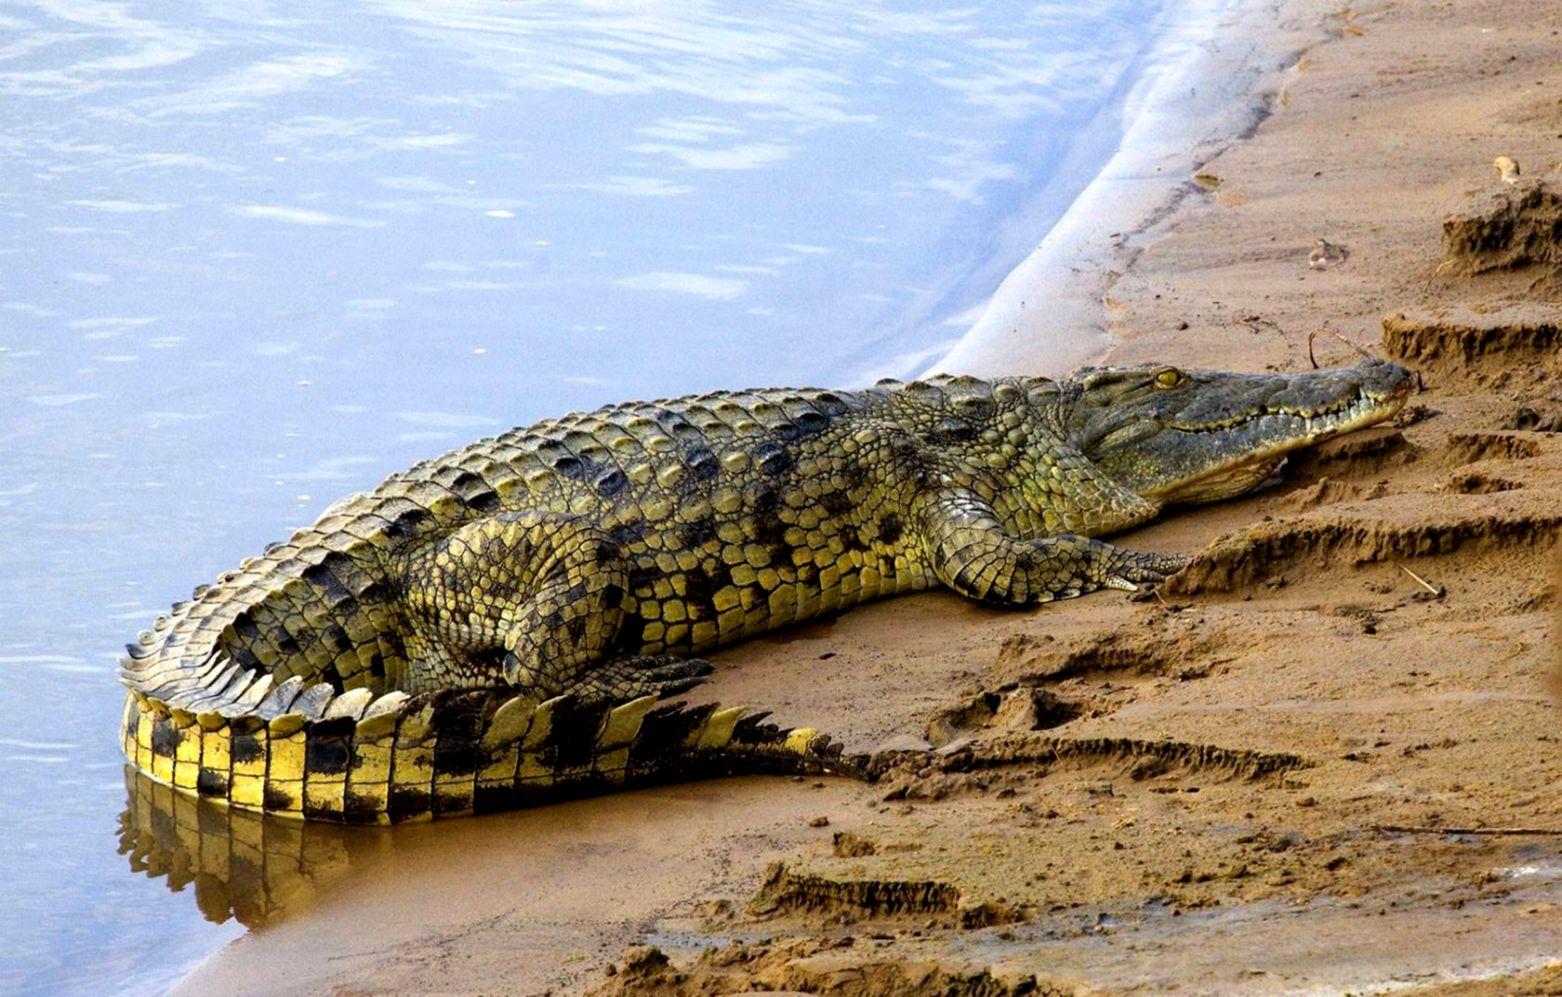 crocodile hd wallpaper wallpapers